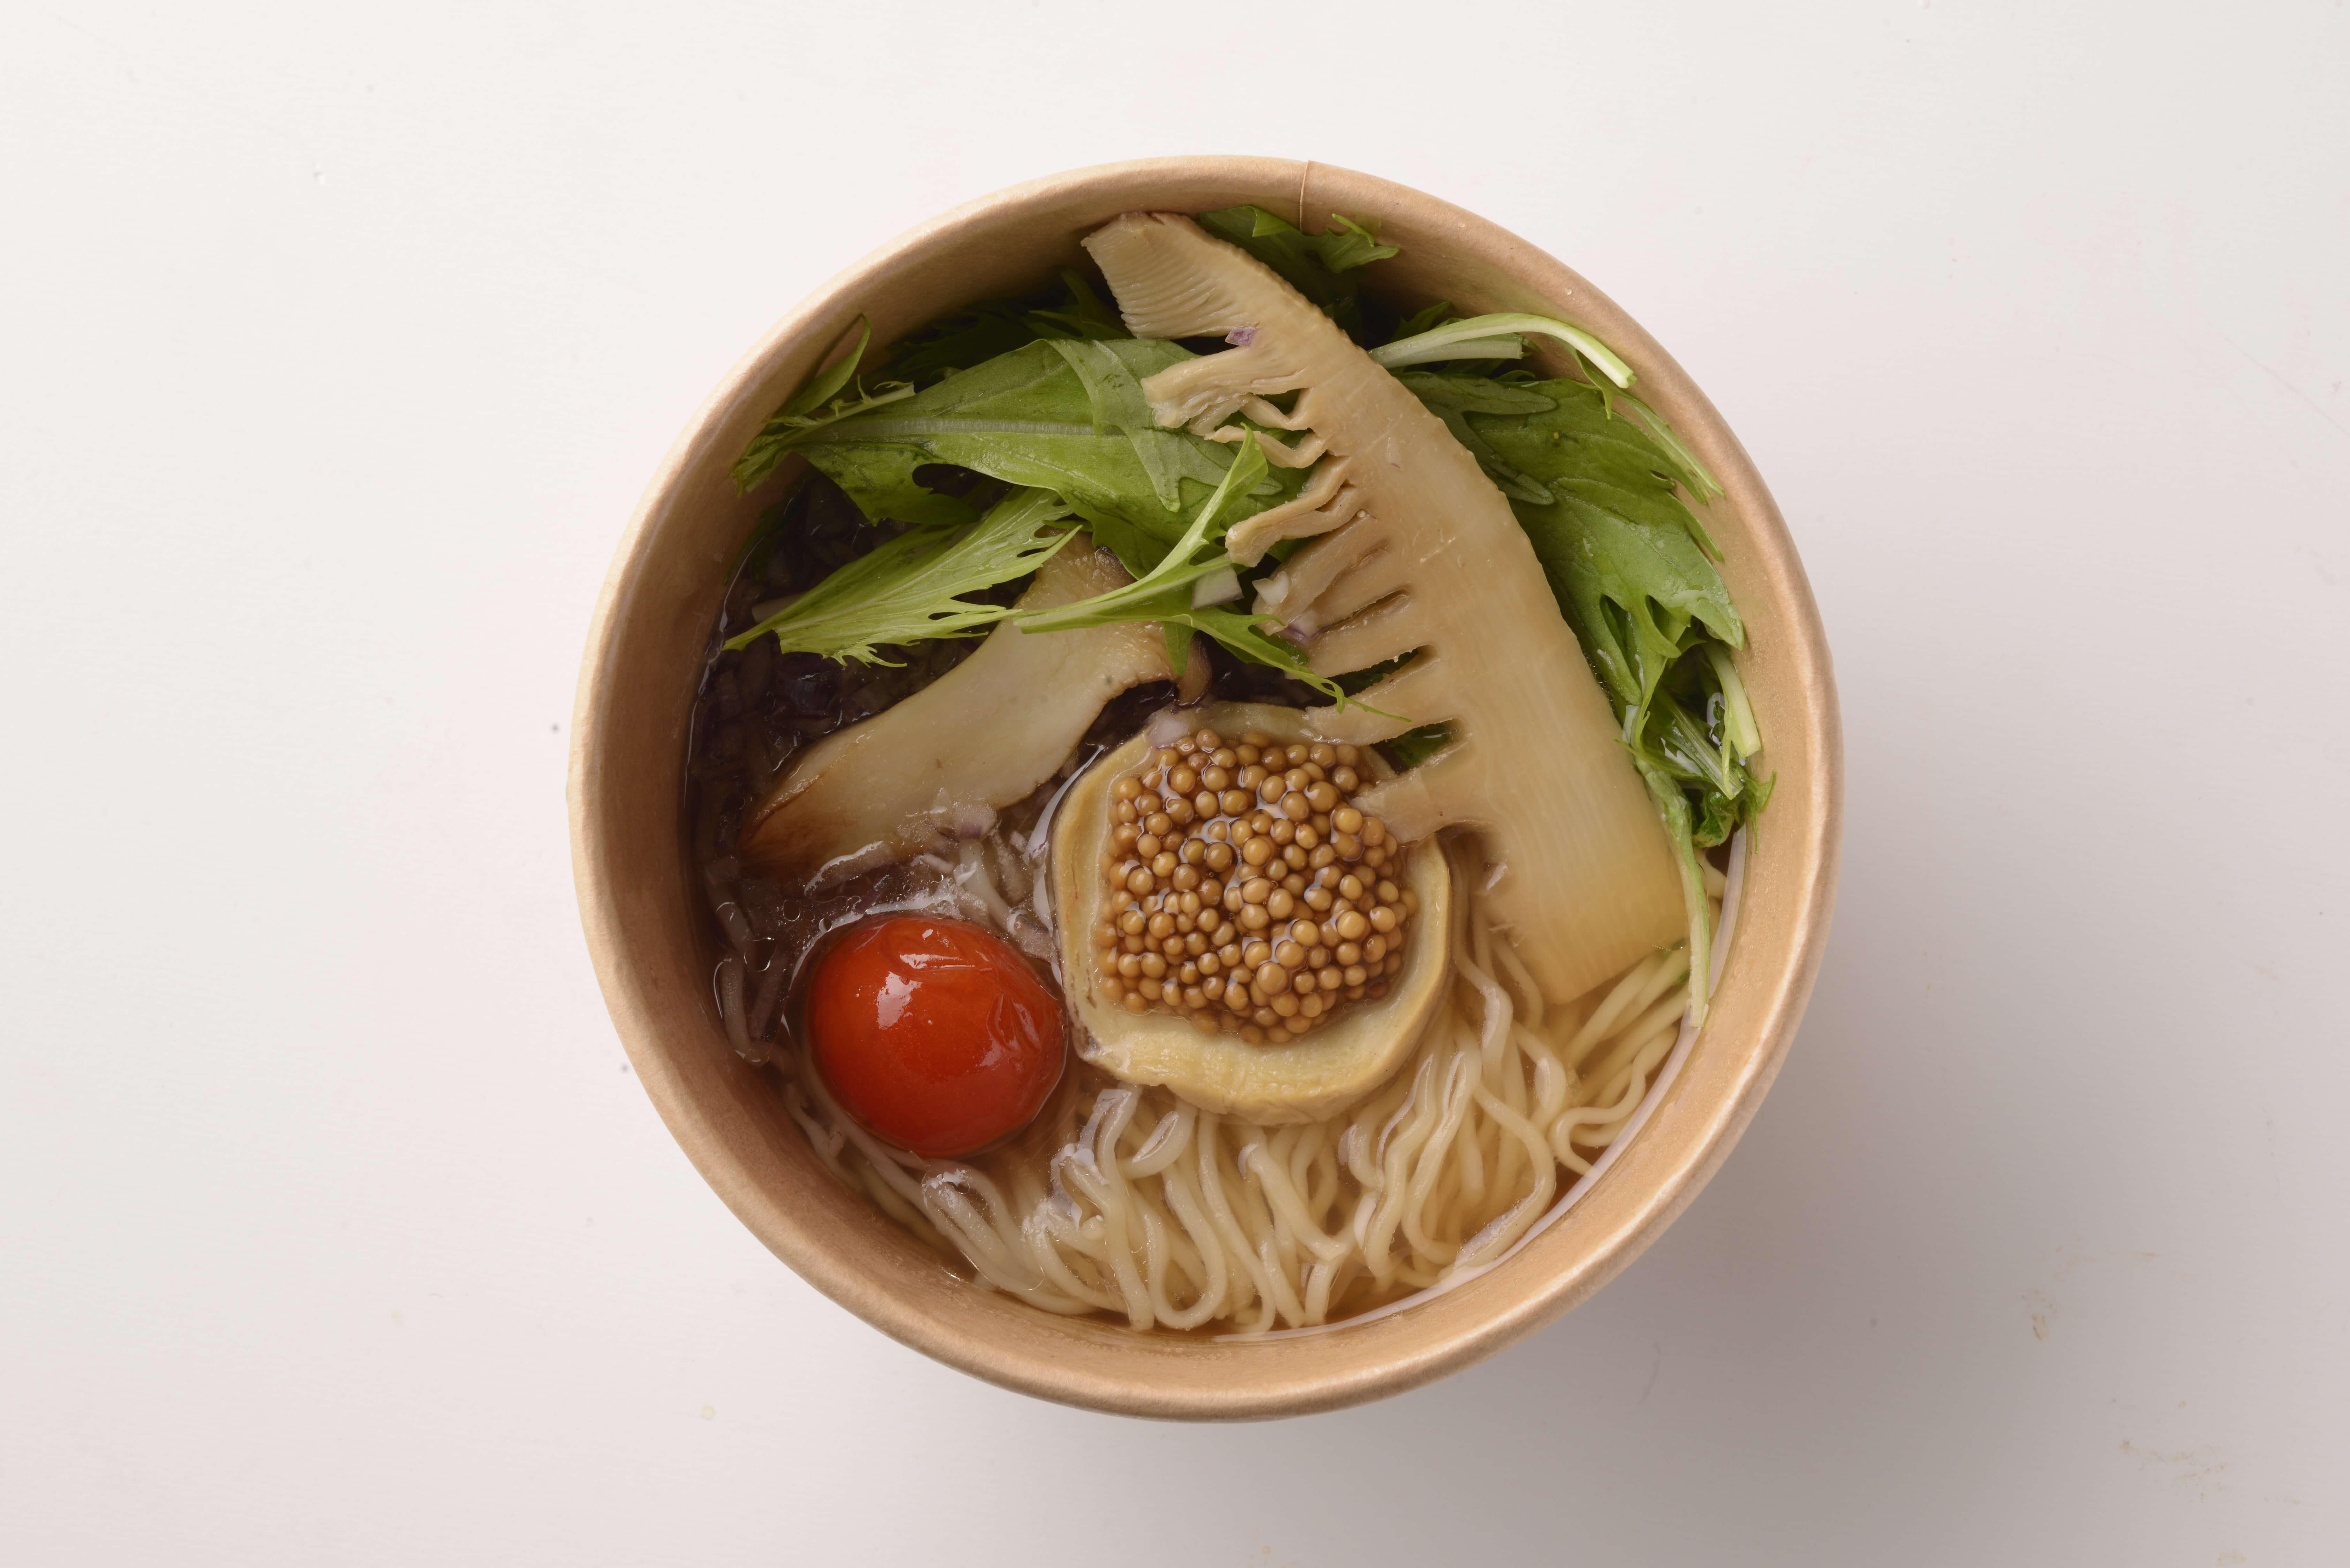 Laforet原宿 知名師傅製作的中華風速食店「Chipoon」開幕 Laforet原宿、原宿午餐、在原宿、